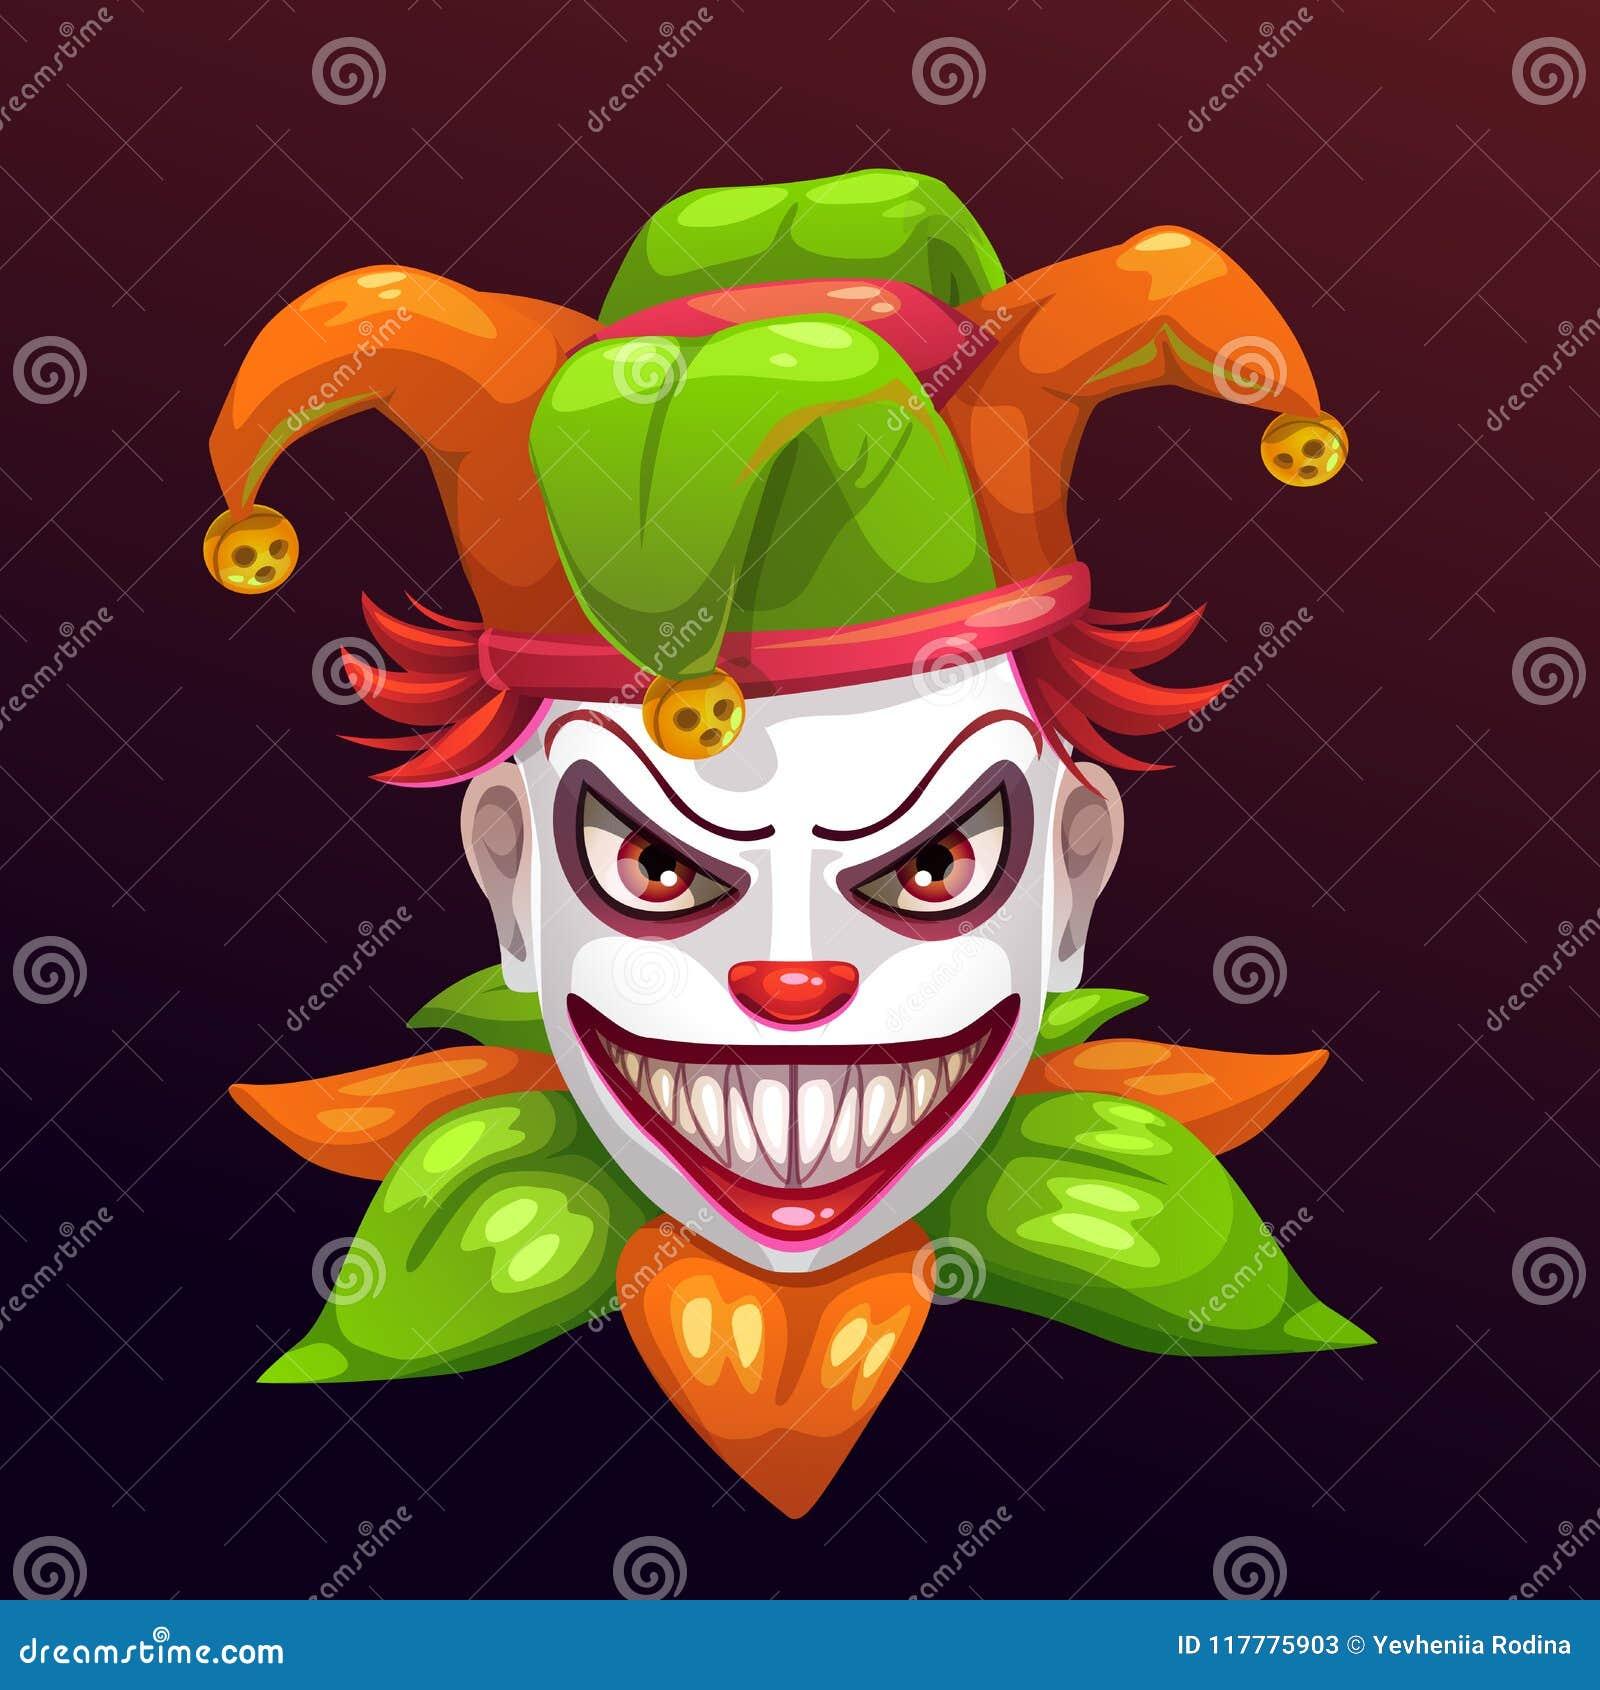 Crazy Creepy Joker Face Stock Vector Illustration Of Devil